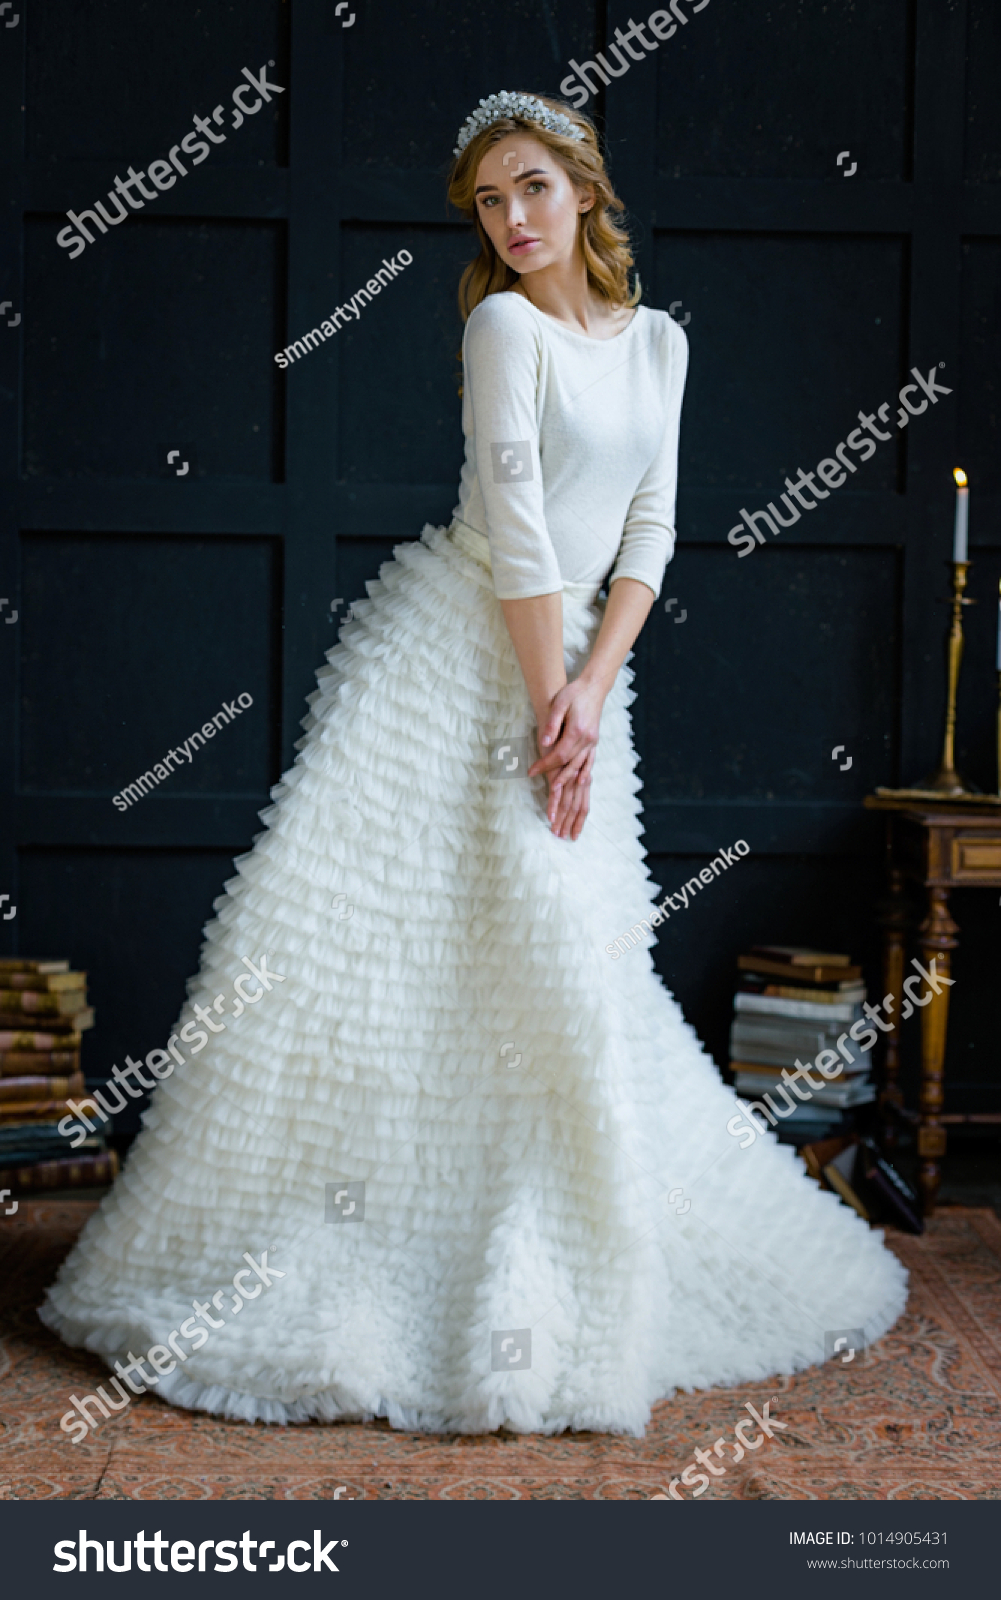 Magnificent Elegant Maternity Wedding Dresses Motif - Womens Dresses ...